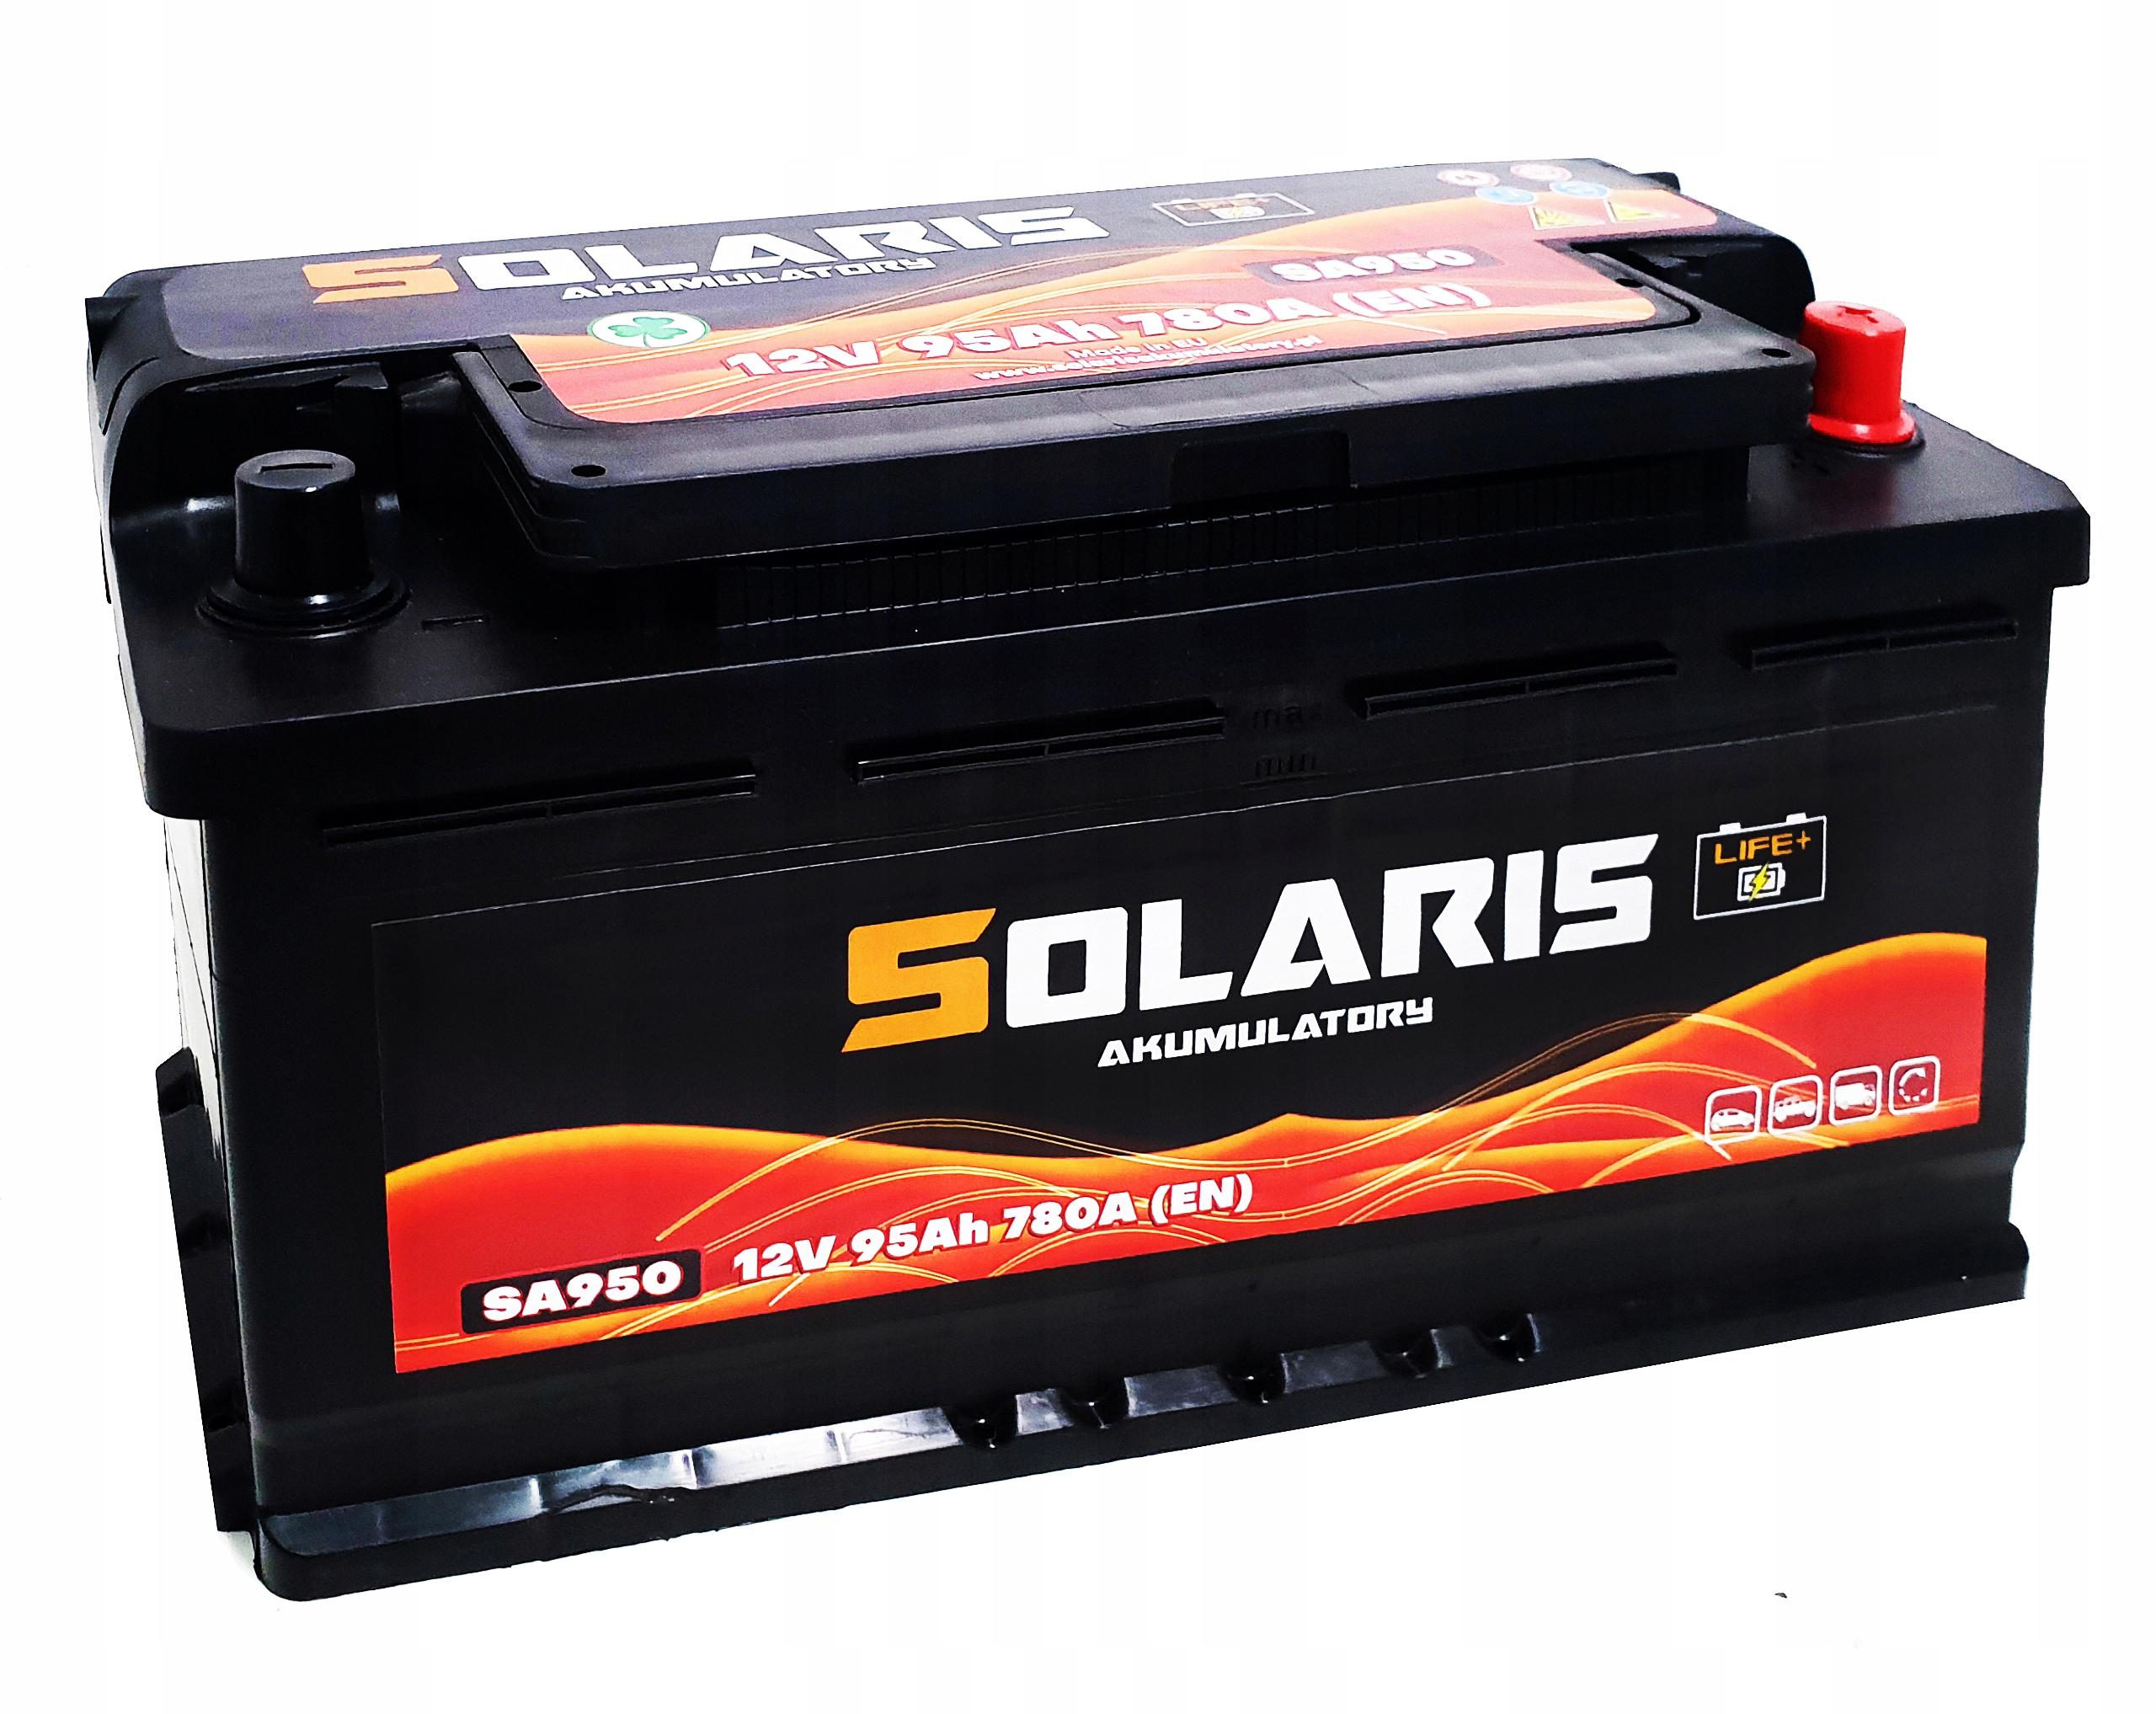 аккумулятор solaris 95ah 780a они 100 950